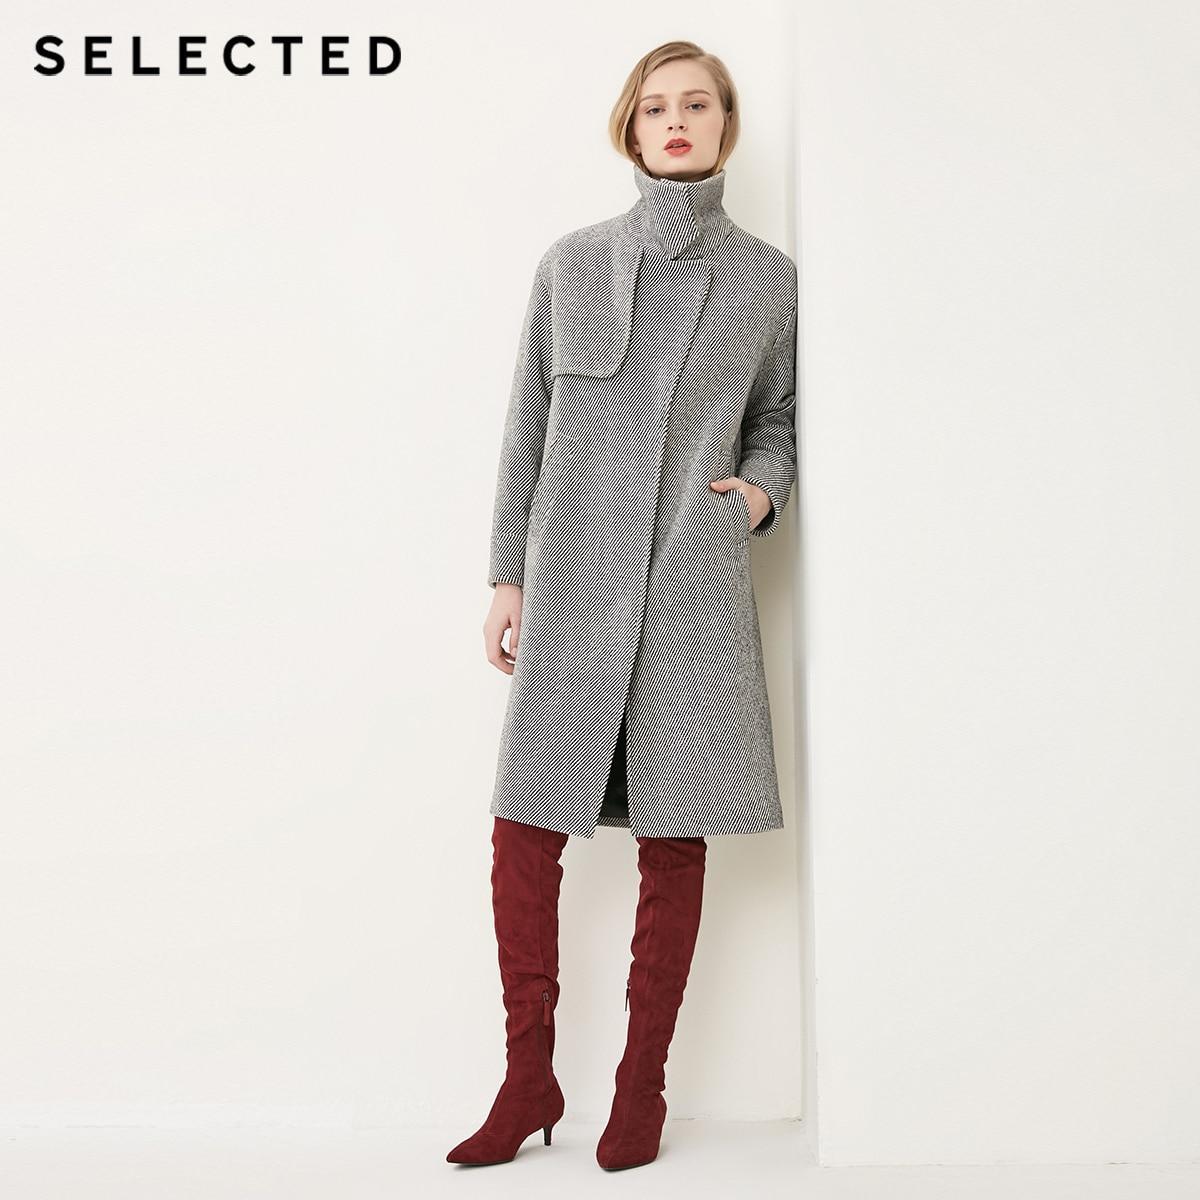 SELECTED Women s Autumn Twill Lapel Medium Style Woolen Coat S 4181J4501